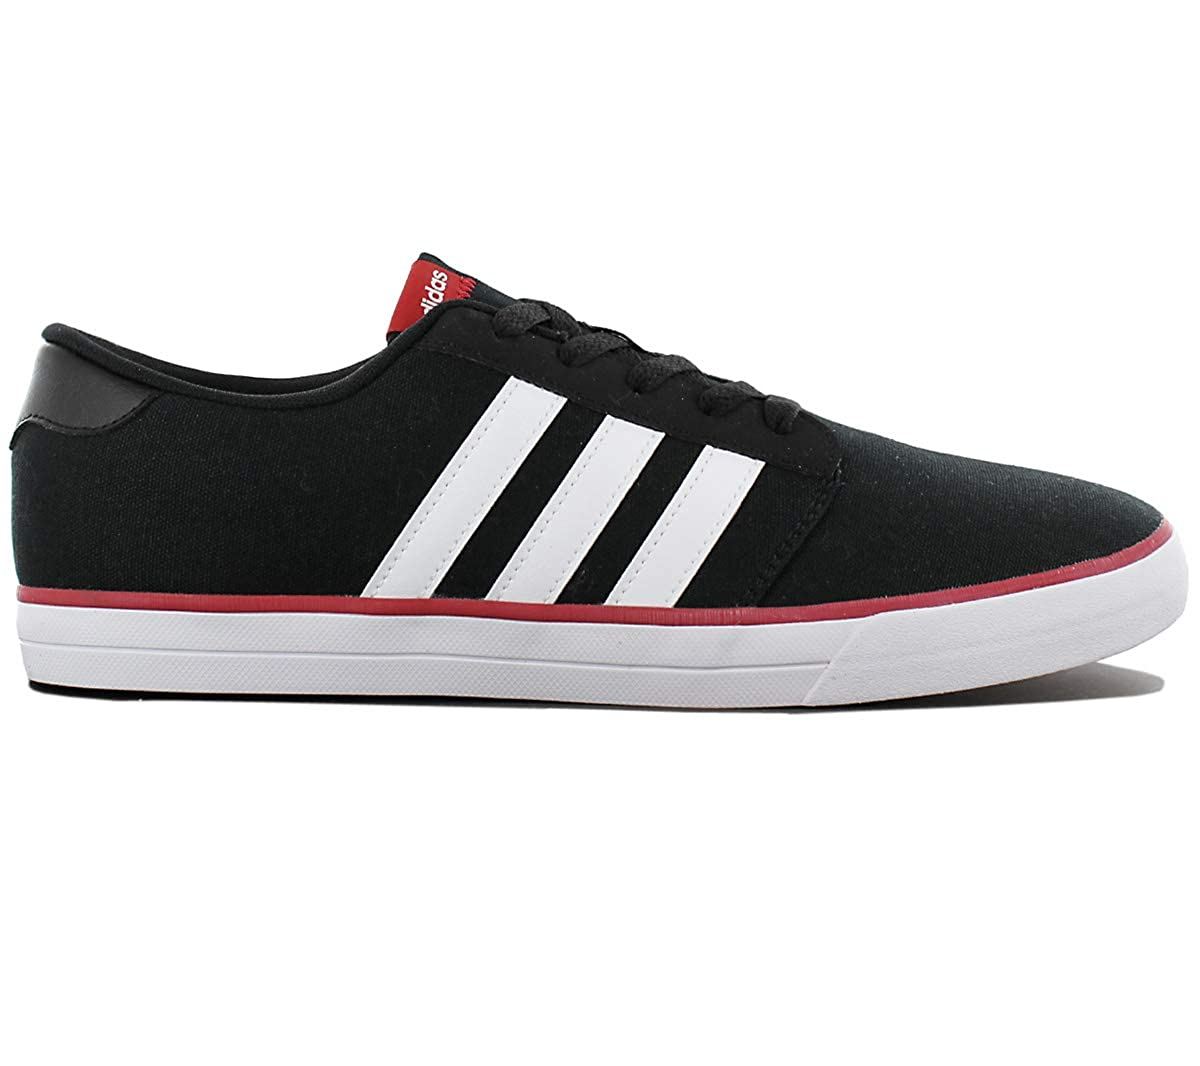 Adidas Skate VS Herren Schuhe Schwarz Schwarz Schwarz Canvas Turnschuhe Skaterschuhe Turnschuhe Sportschuhe 39ad97